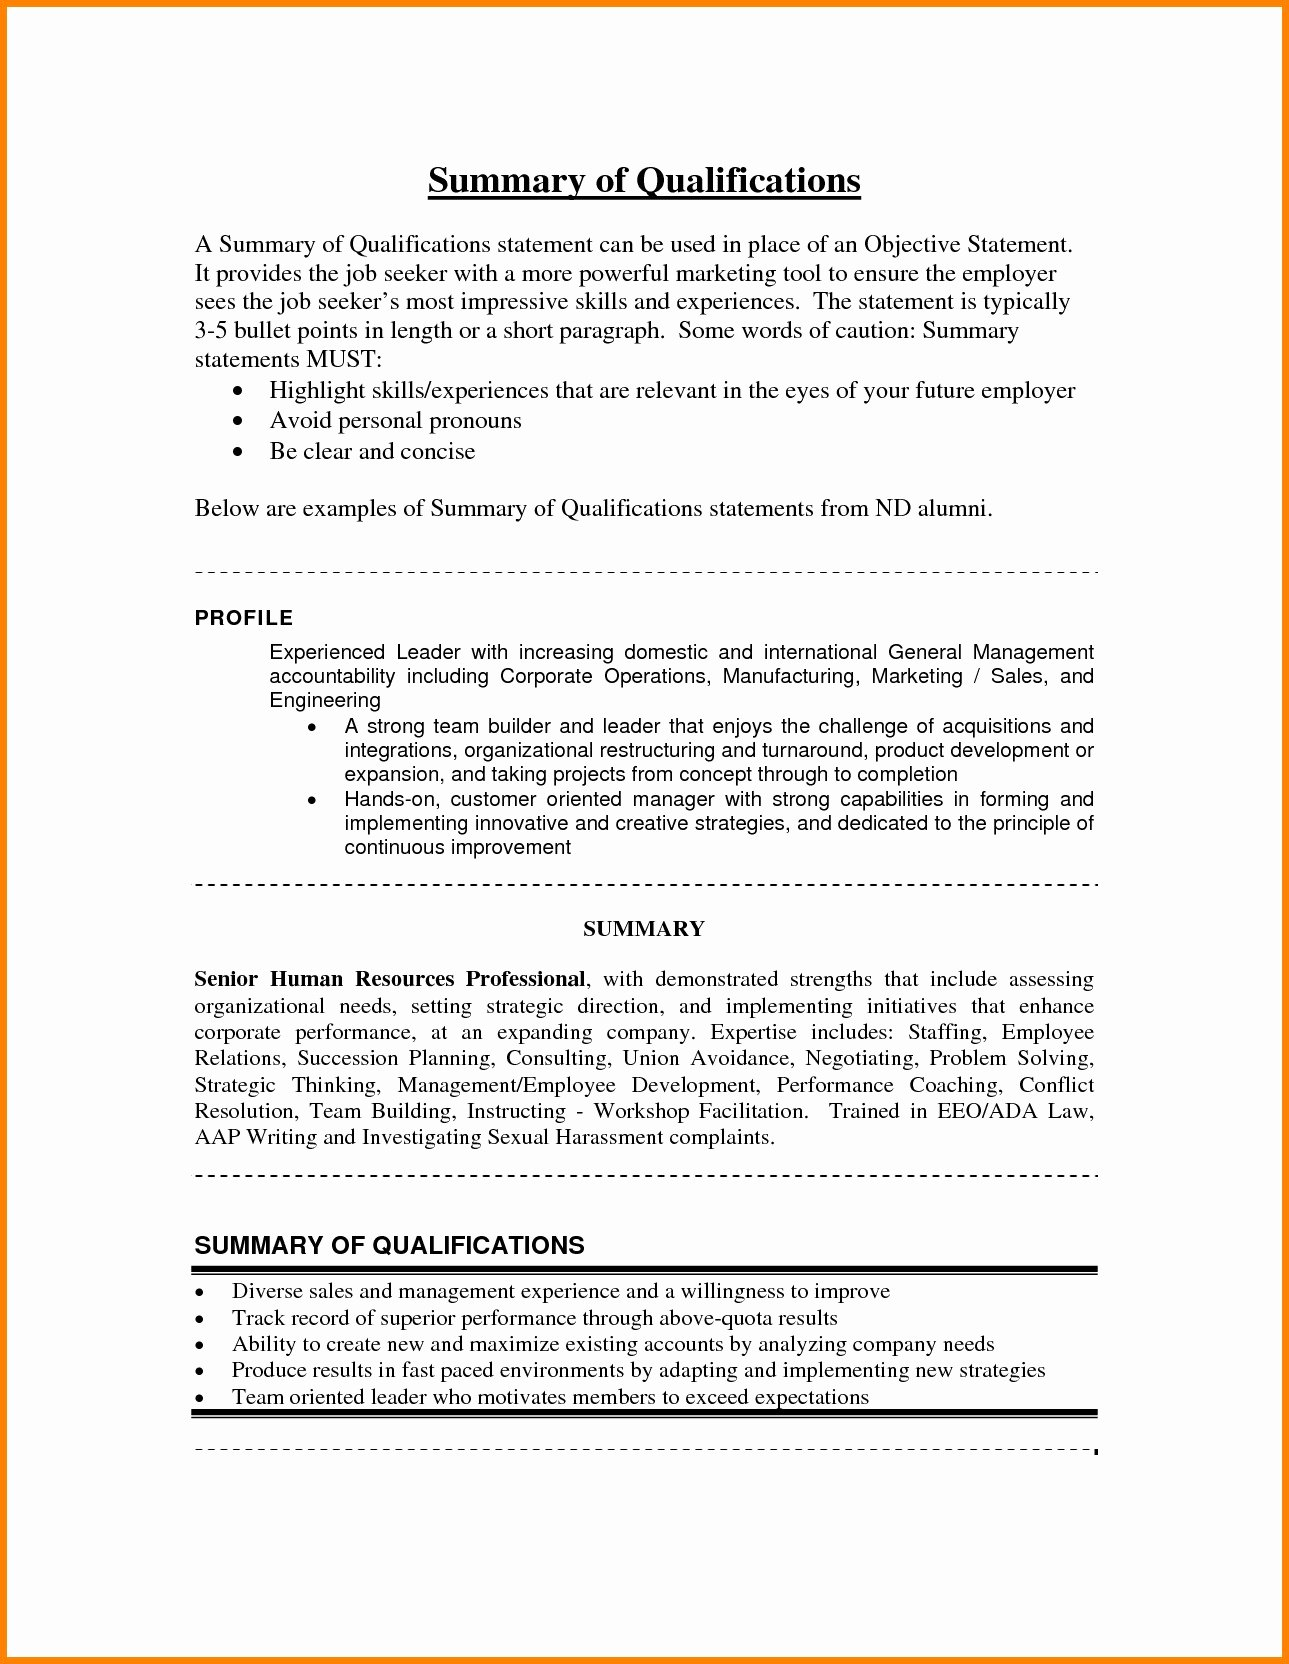 Resume Summary Statement Example Resume Summary Statement